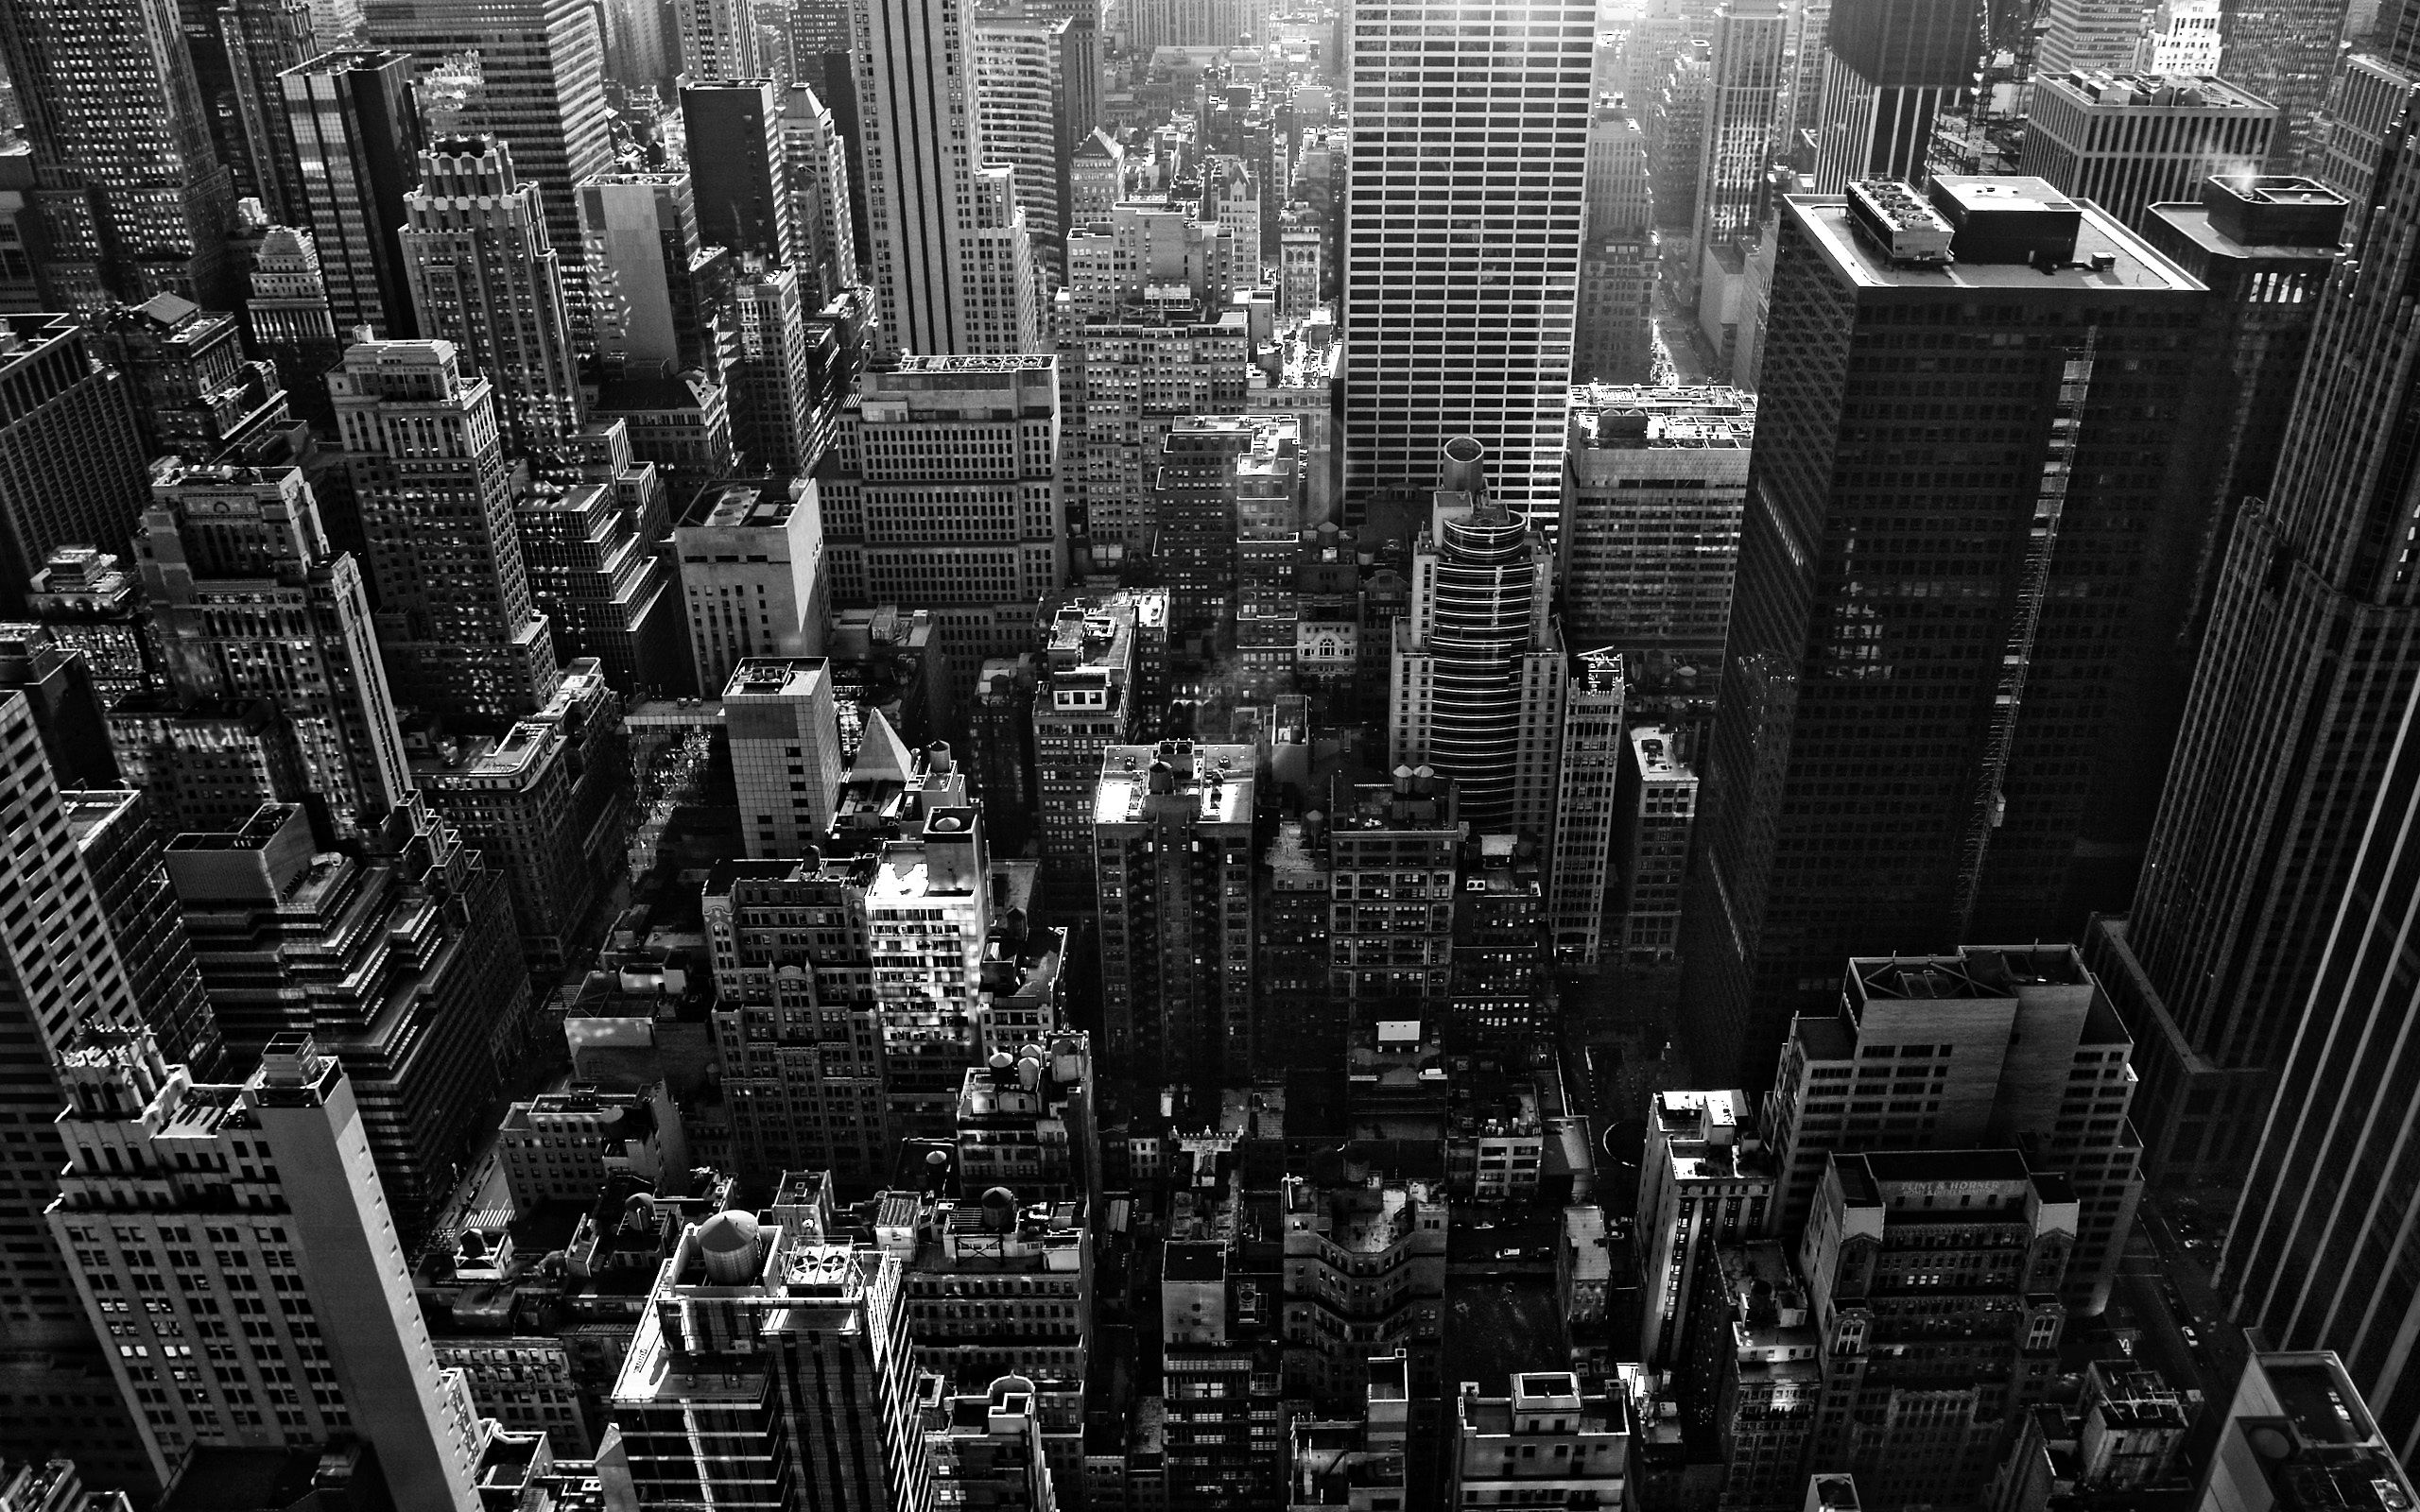 Pics For Los Angeles Skyline At Night Black And White Jpg 2560 1600 New York Wallpaper York Wallpaper Landscape Wallpaper